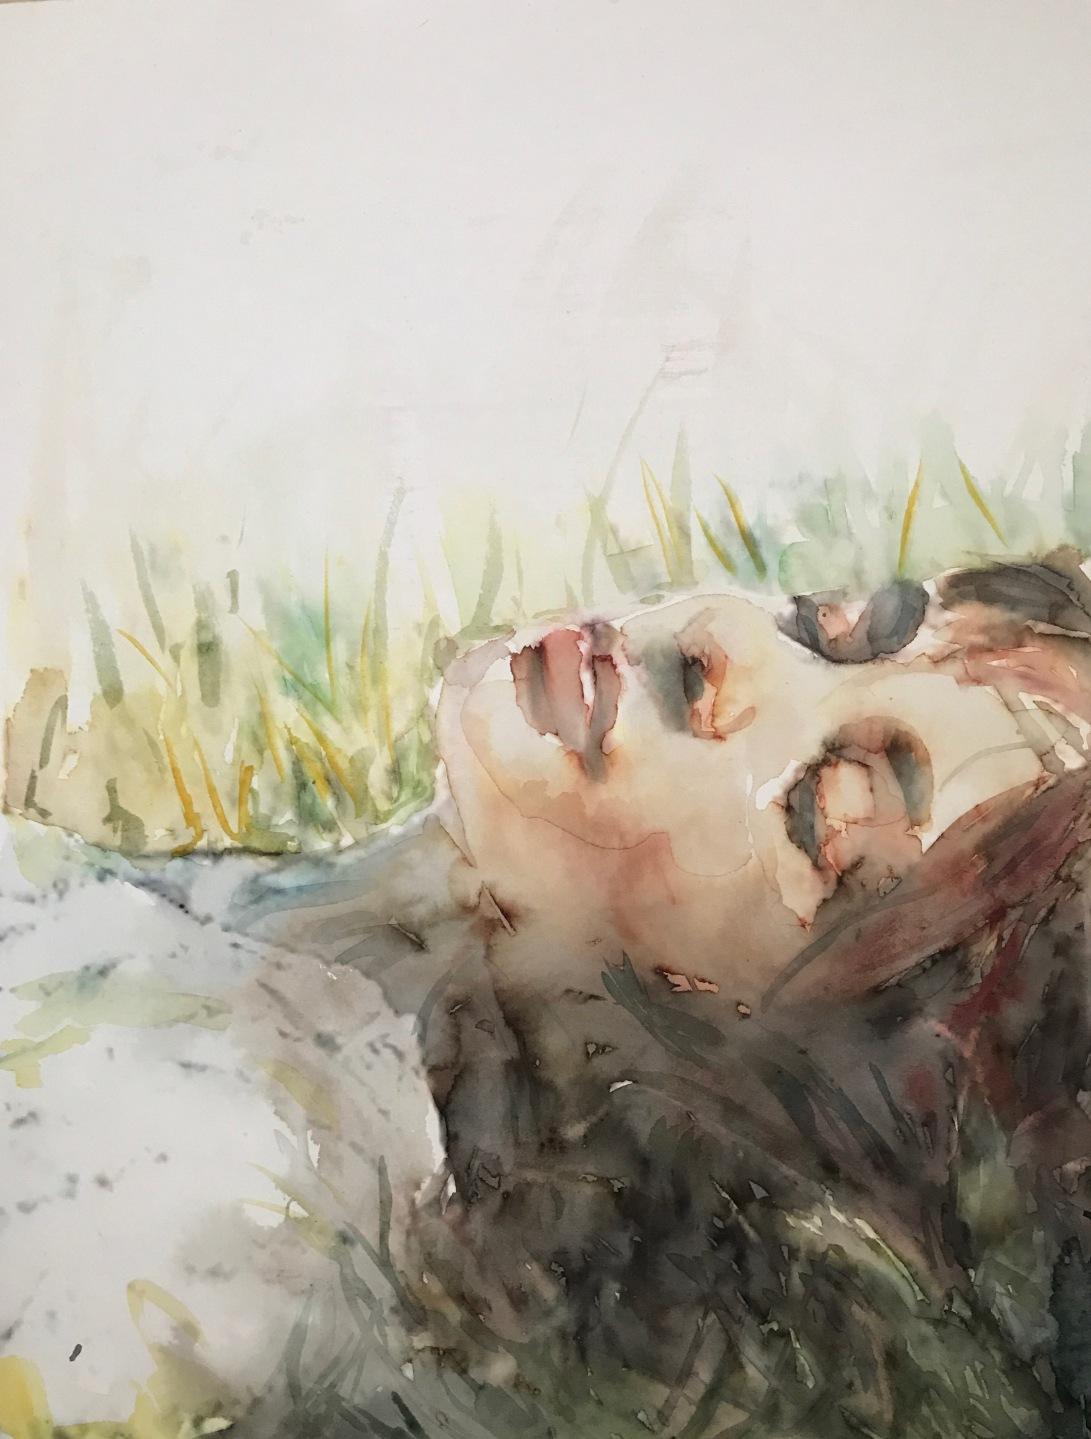 doze_Edna Carla Stradioto_watercolor in Hahnemuhle Anniversary Edition 425 gsm_36x48cm